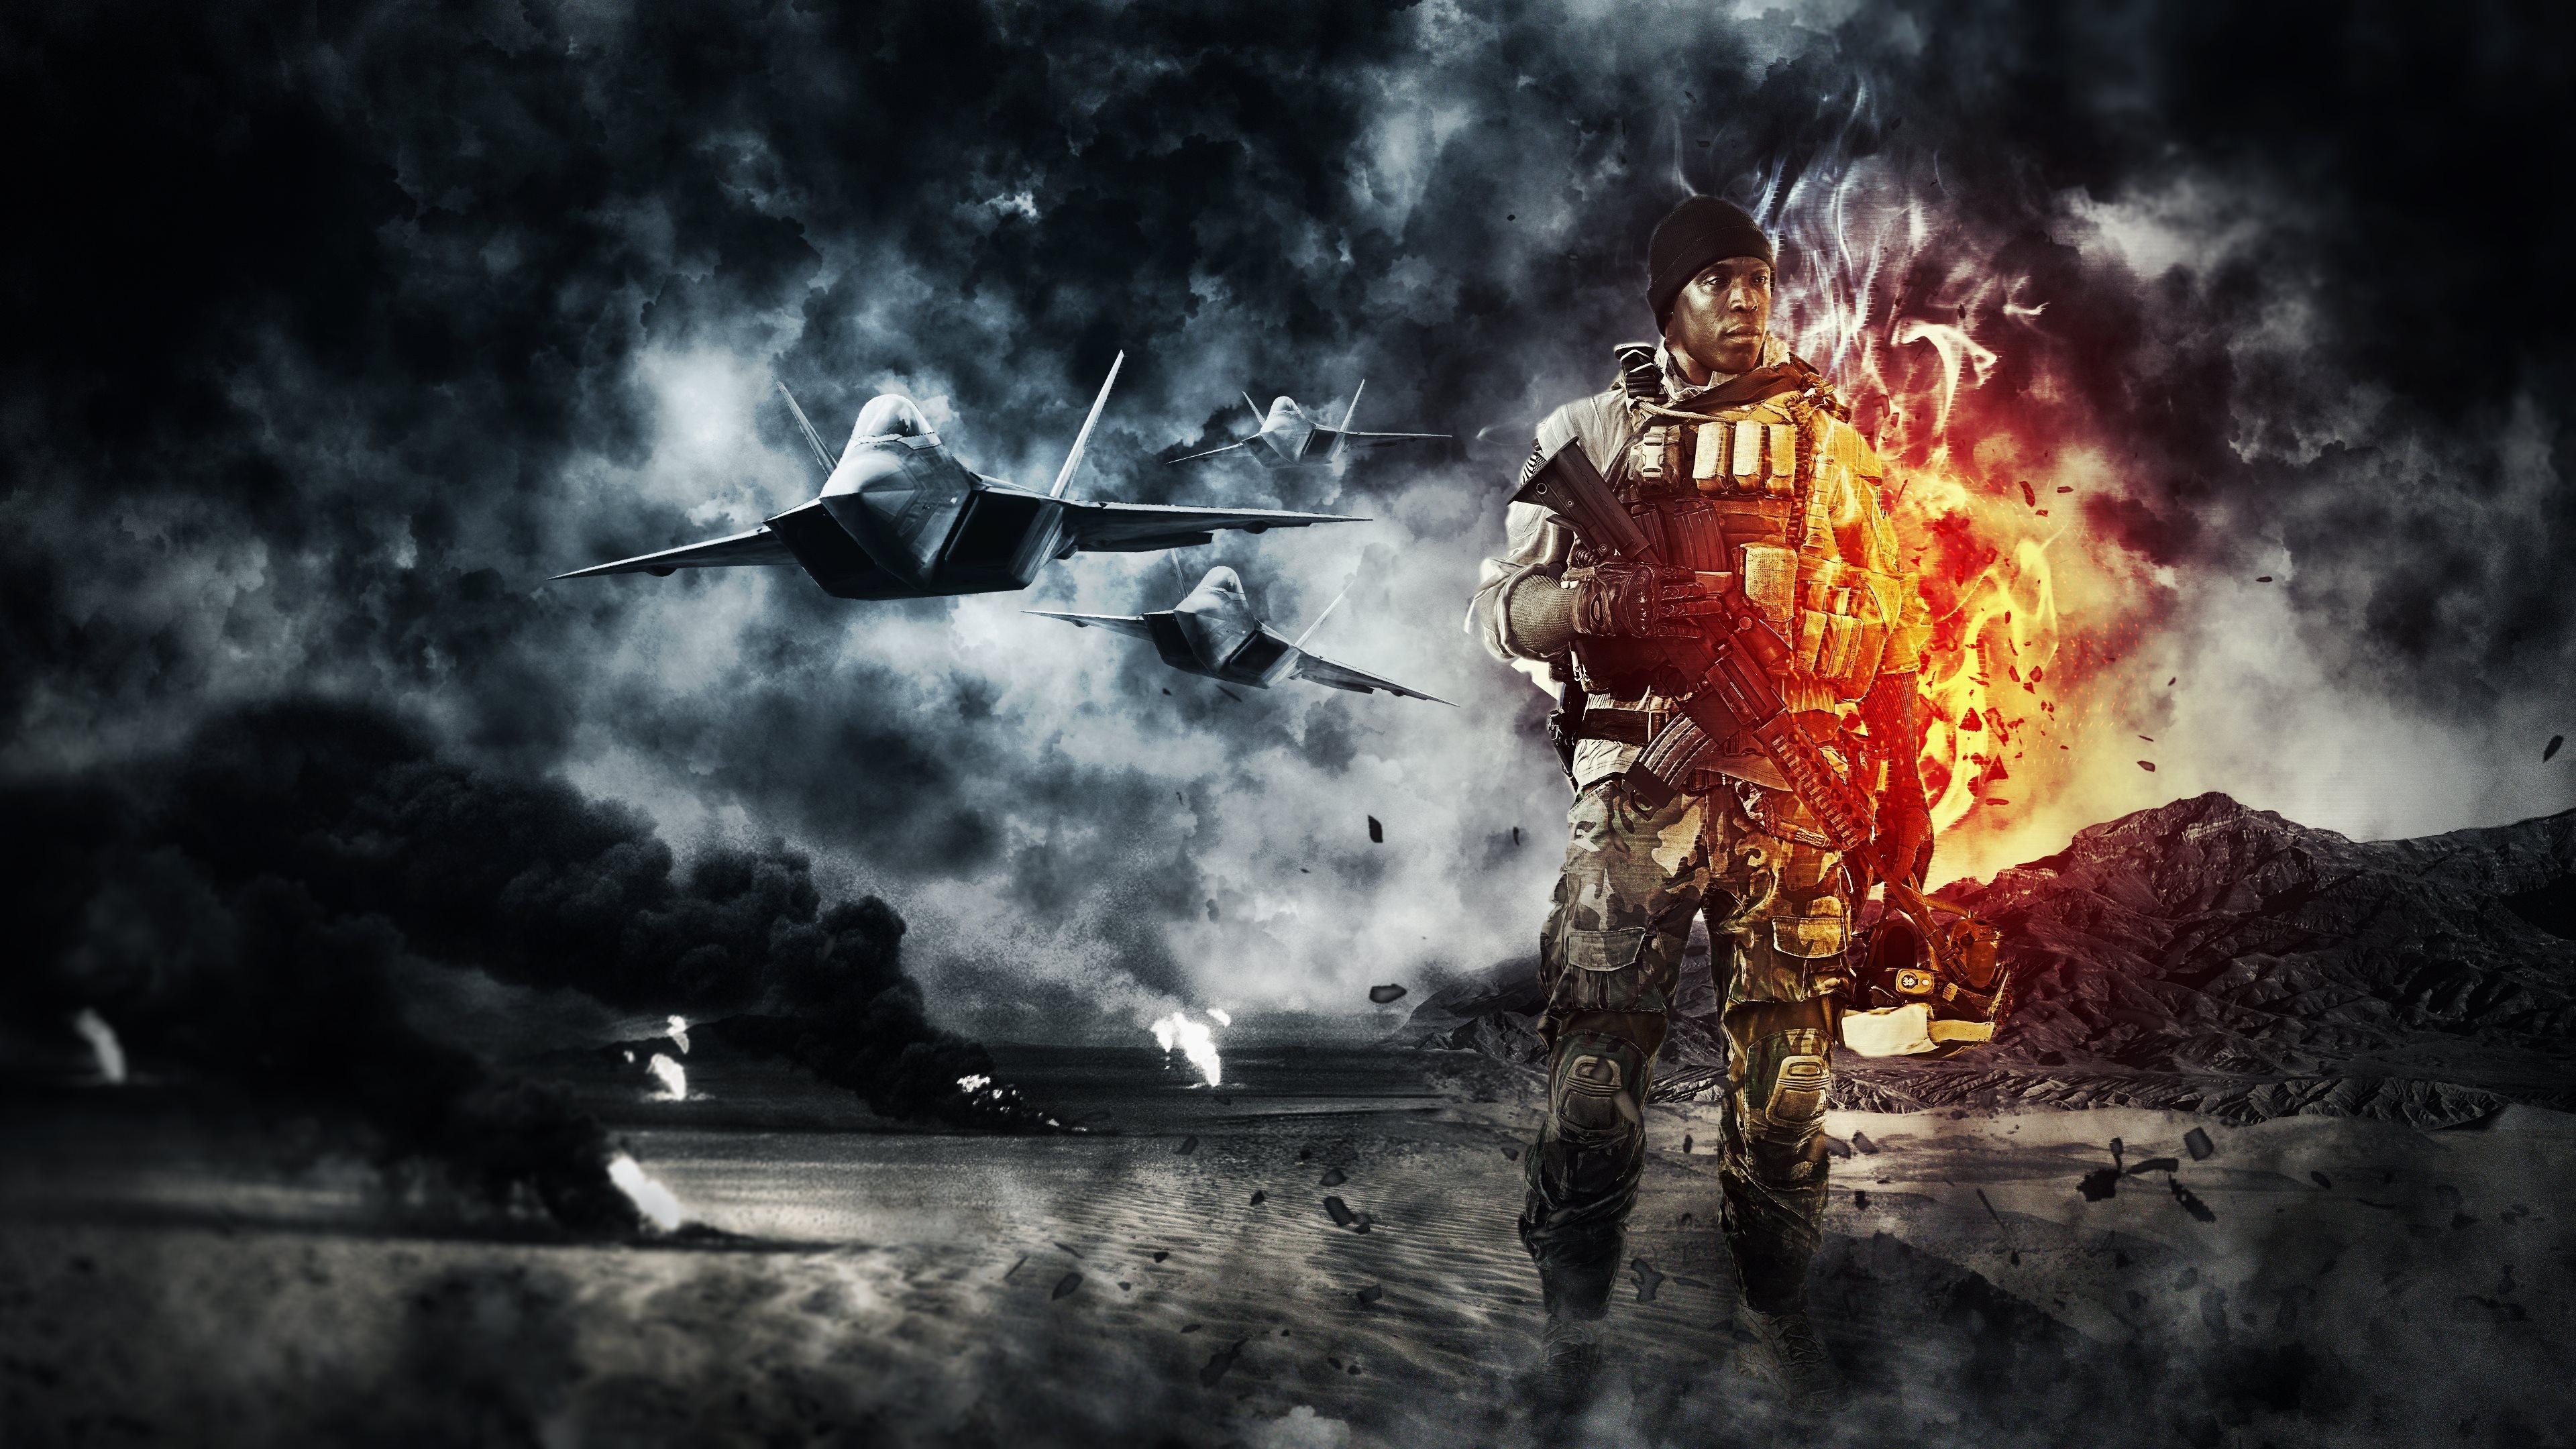 46 Battlefield 4k Wallpaper On Wallpapersafari